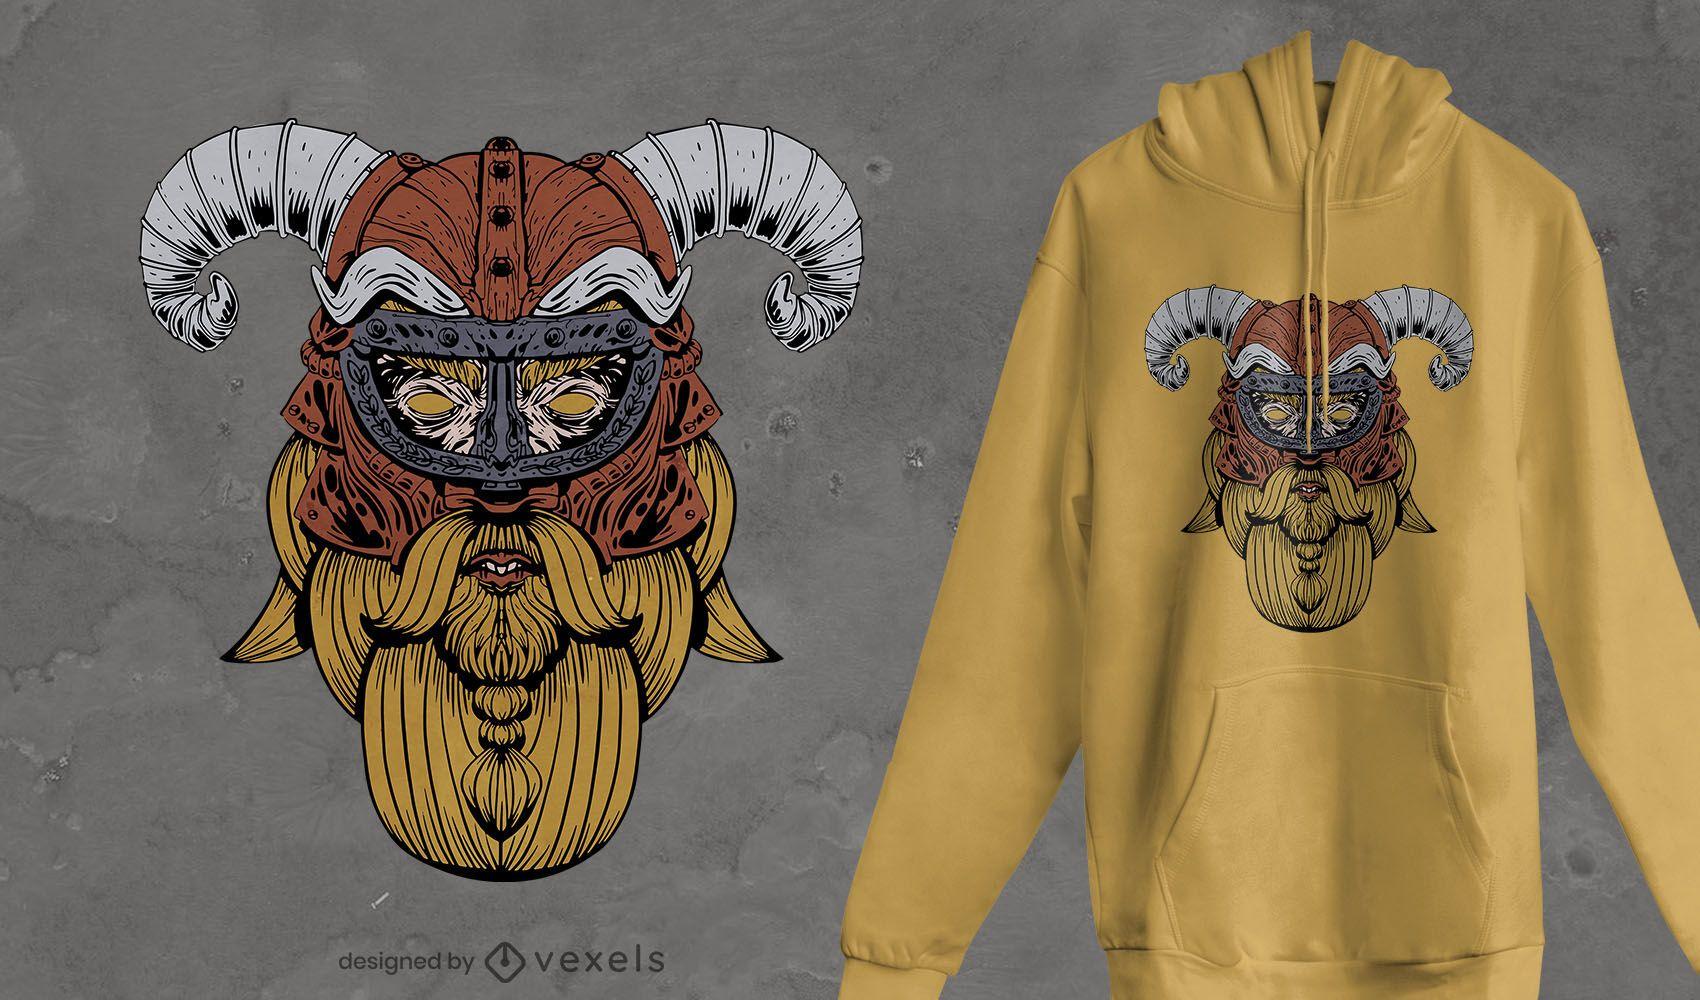 Viking face t-shirt design